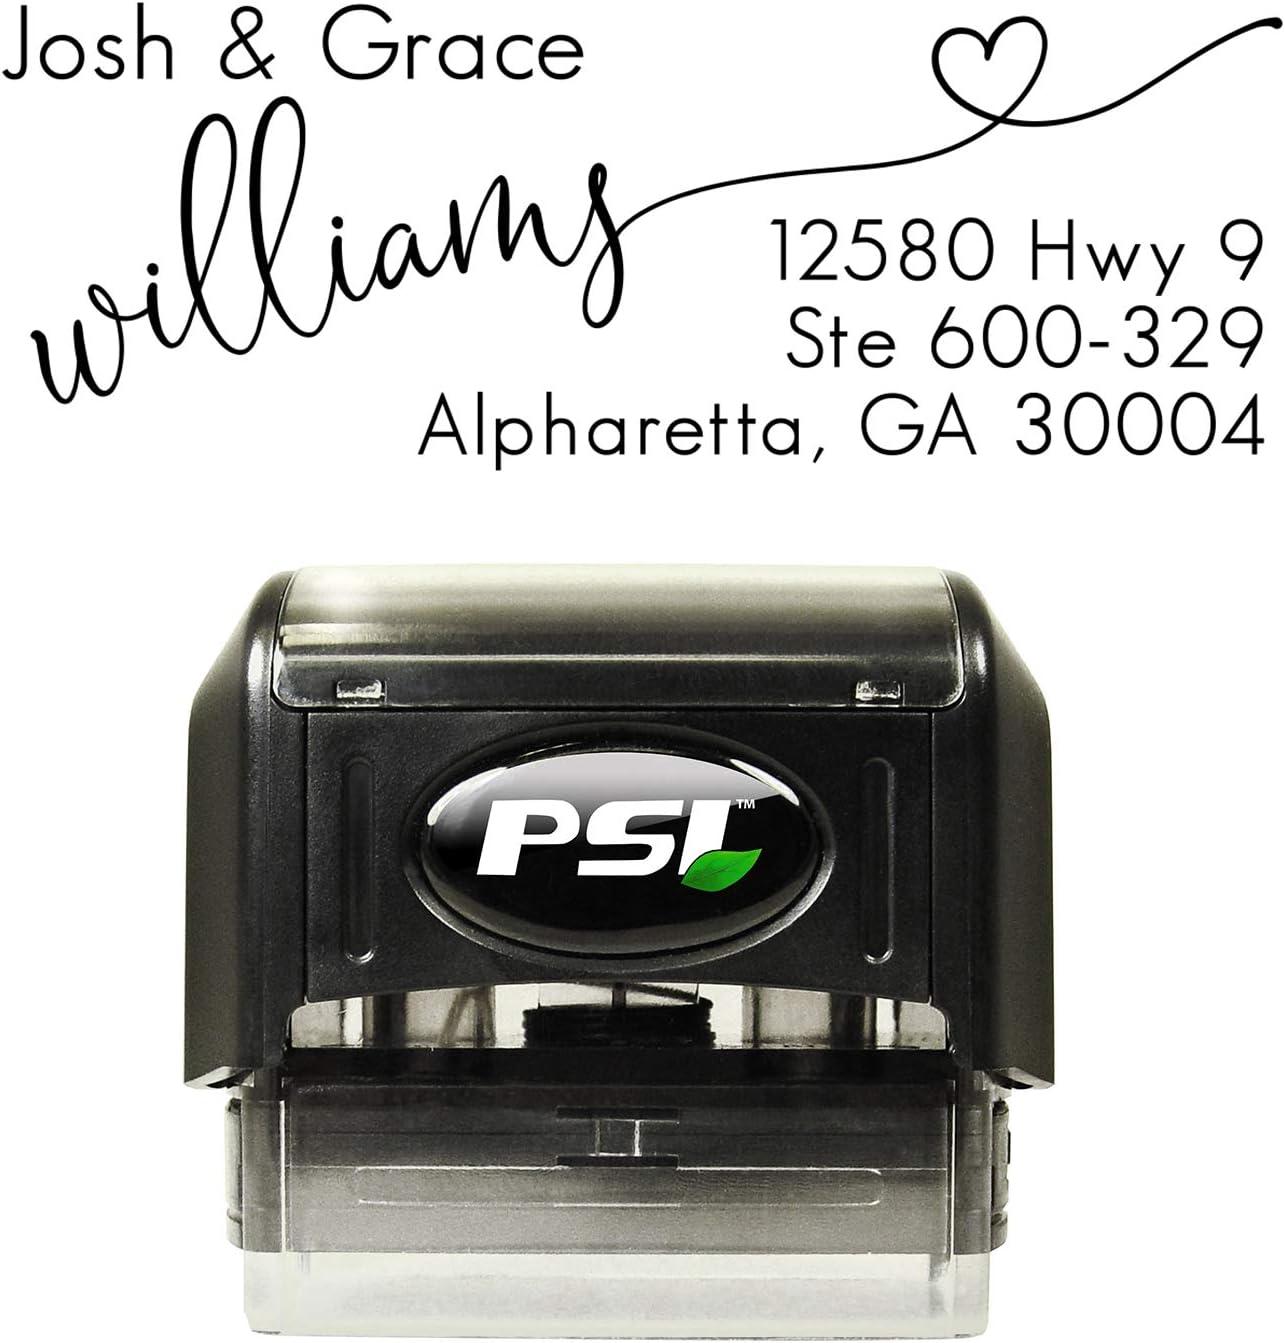 Personalized Address Stamp Black Ink Custom Self Inking Stamper